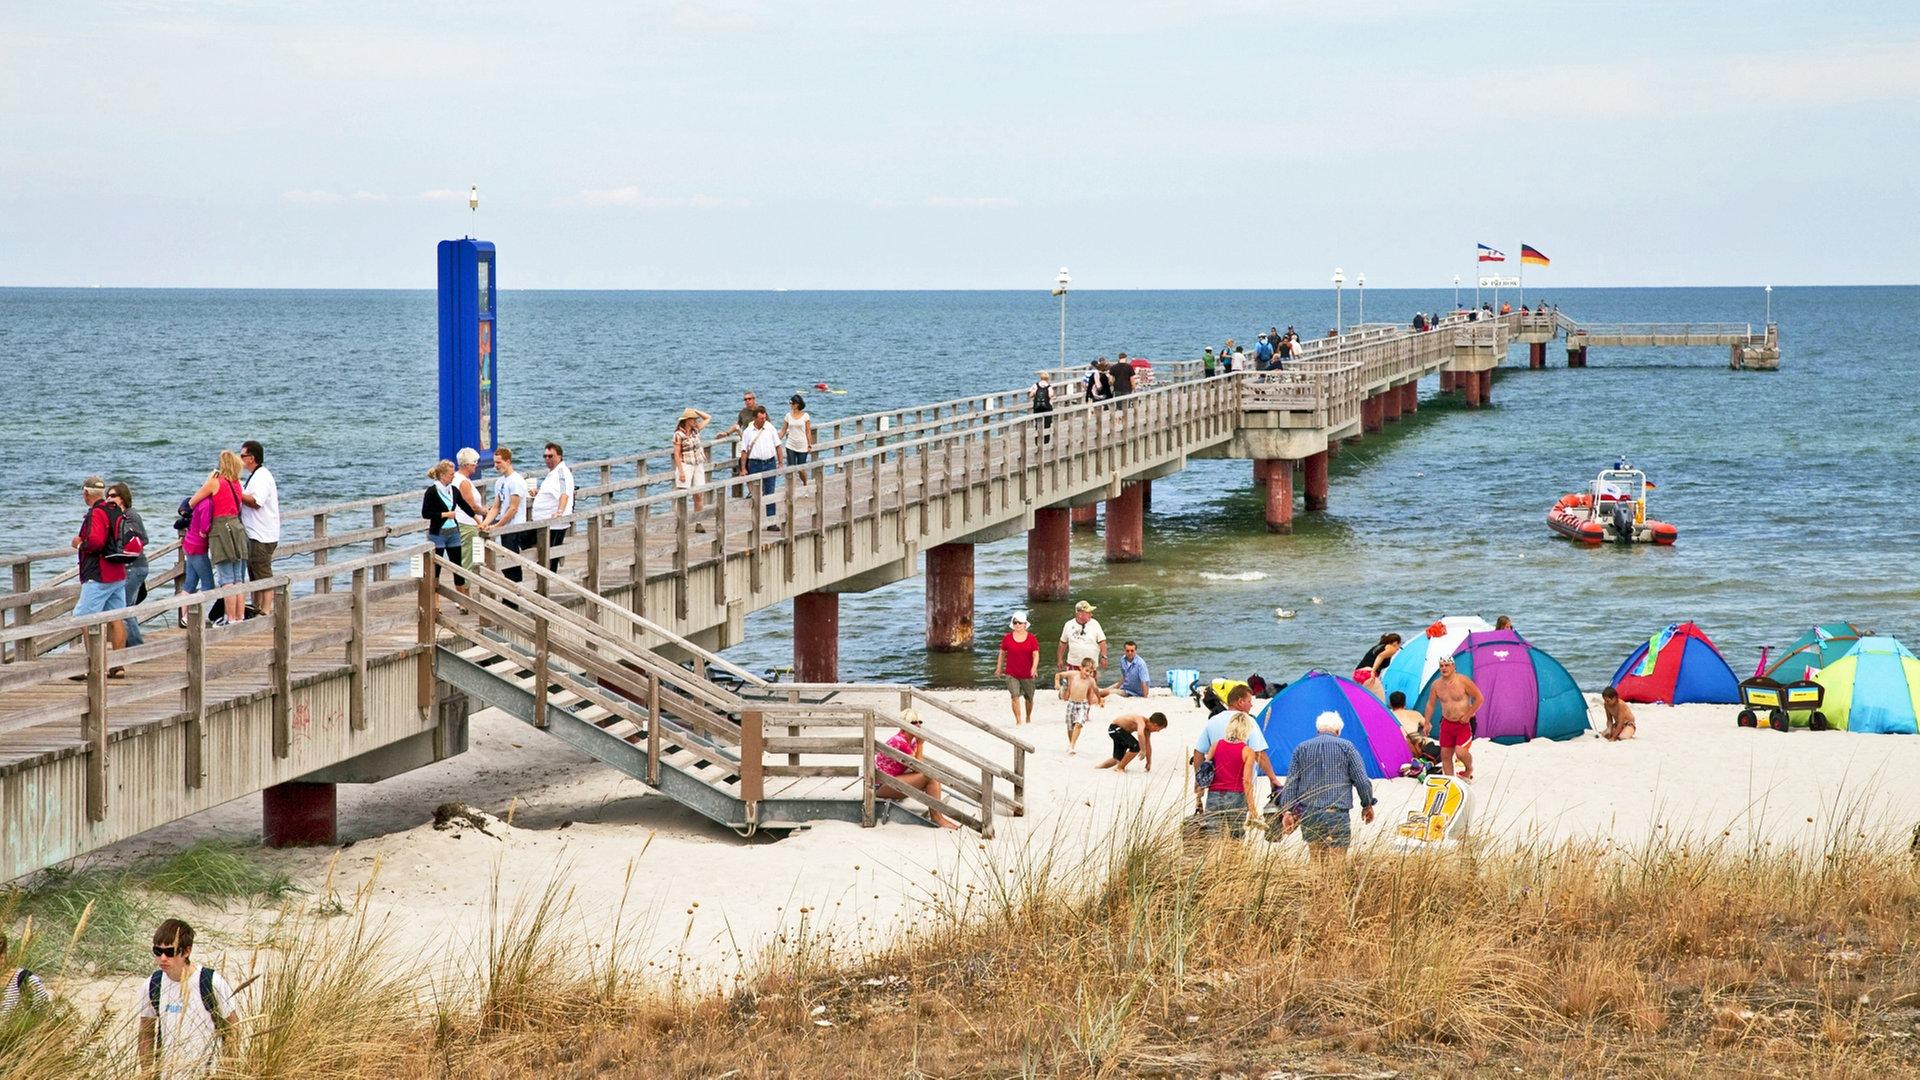 Seebad Prerow Strand, Wald und Ostsee   NDR.de   Ratgeber   Reise ...